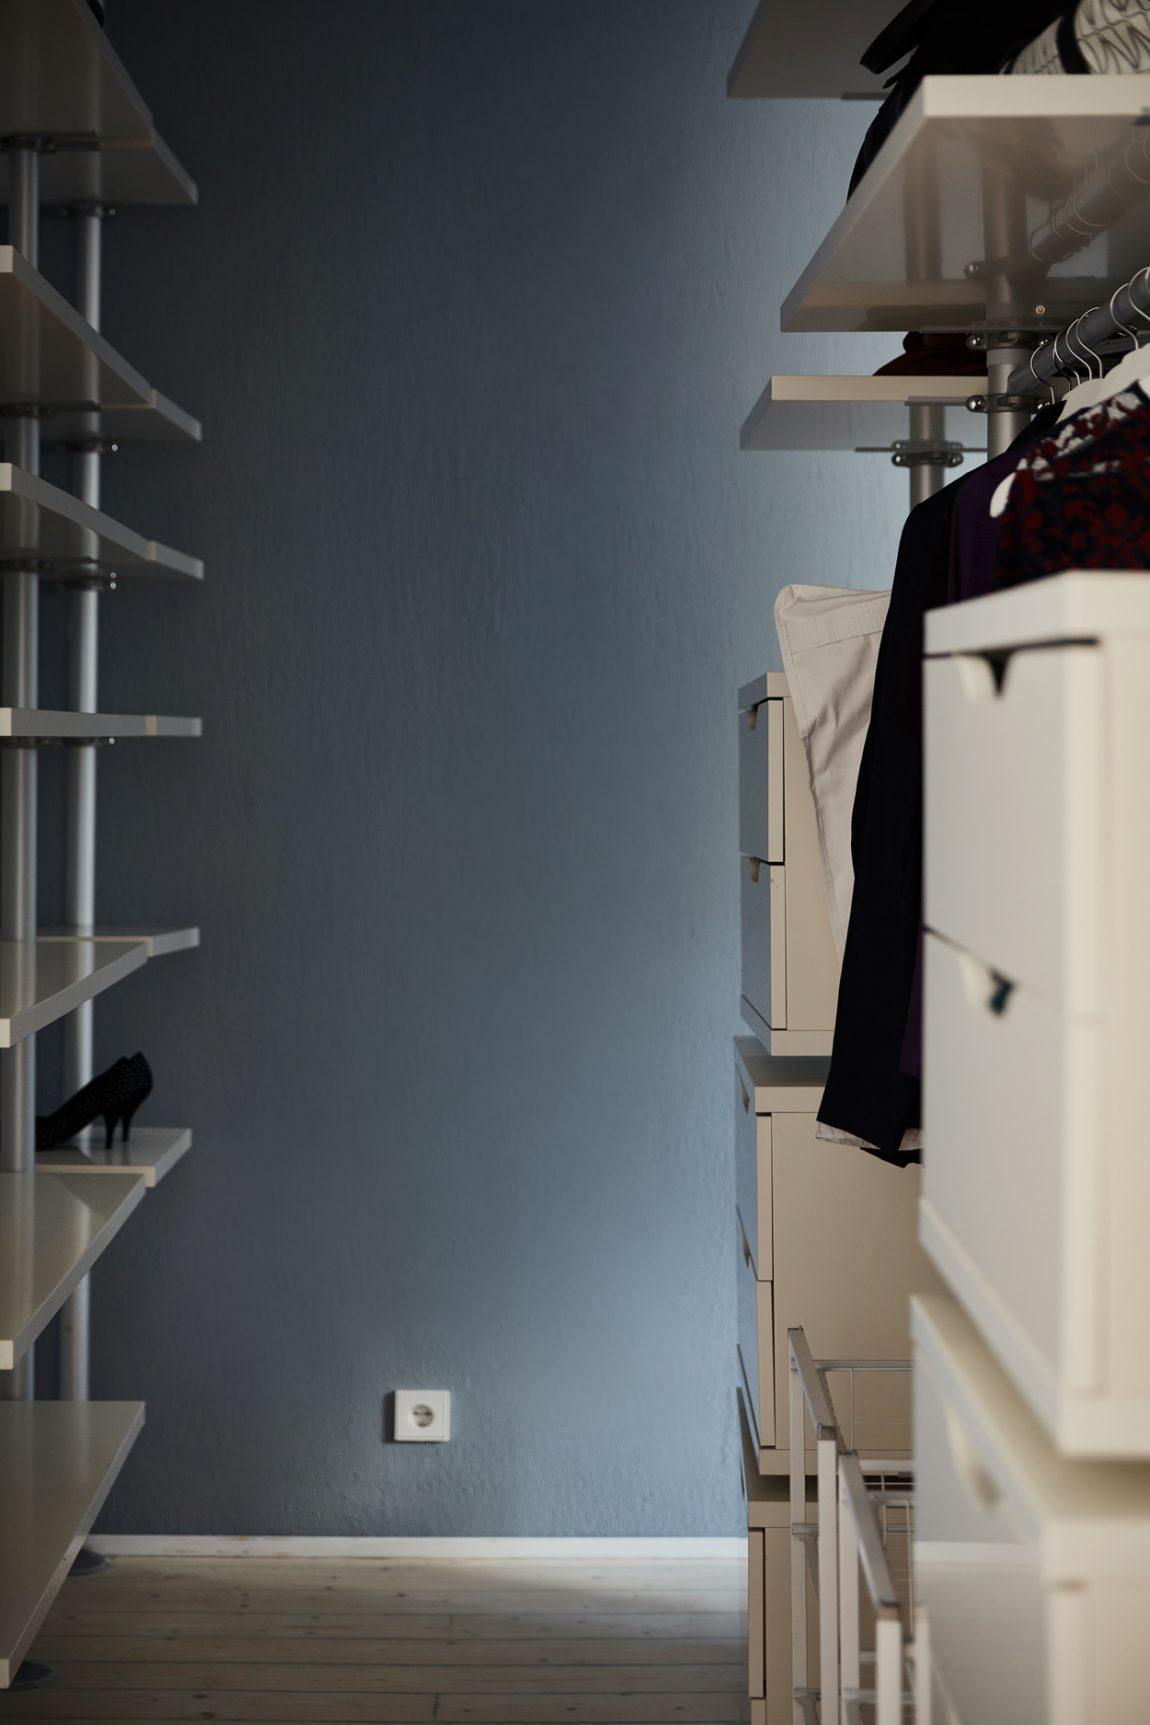 slaapkamer ikea inloopkast